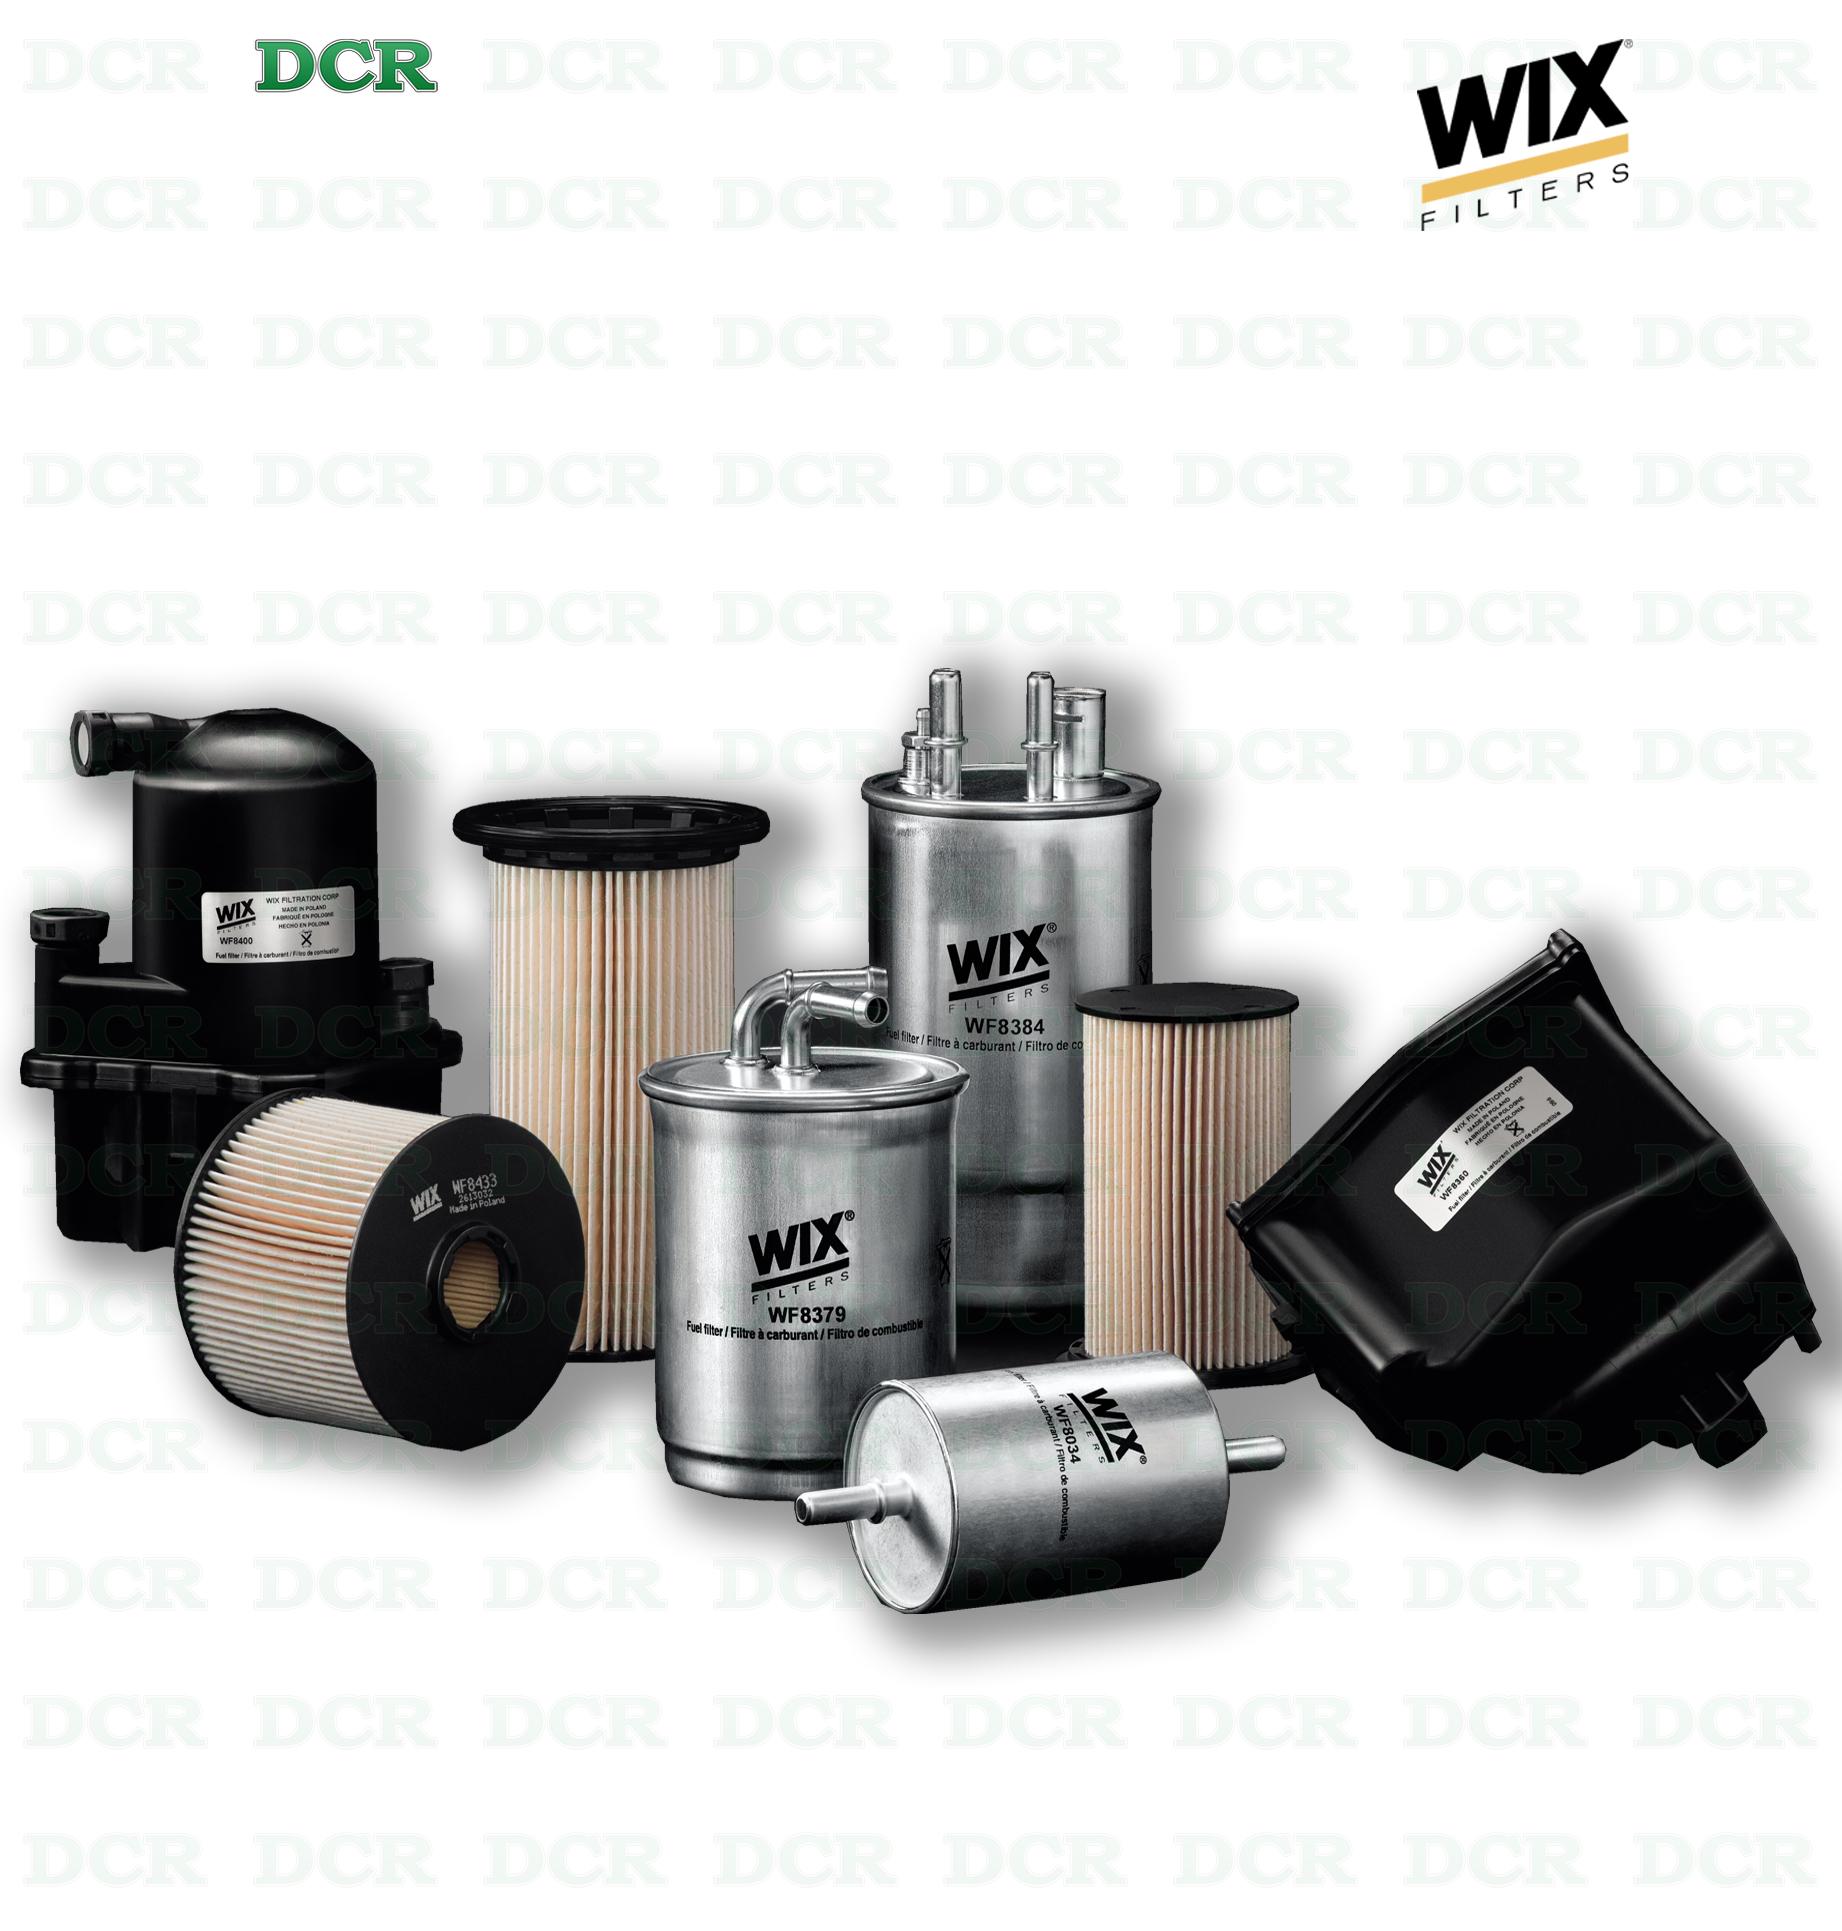 Wix Filters WF8367 Filtro carburante